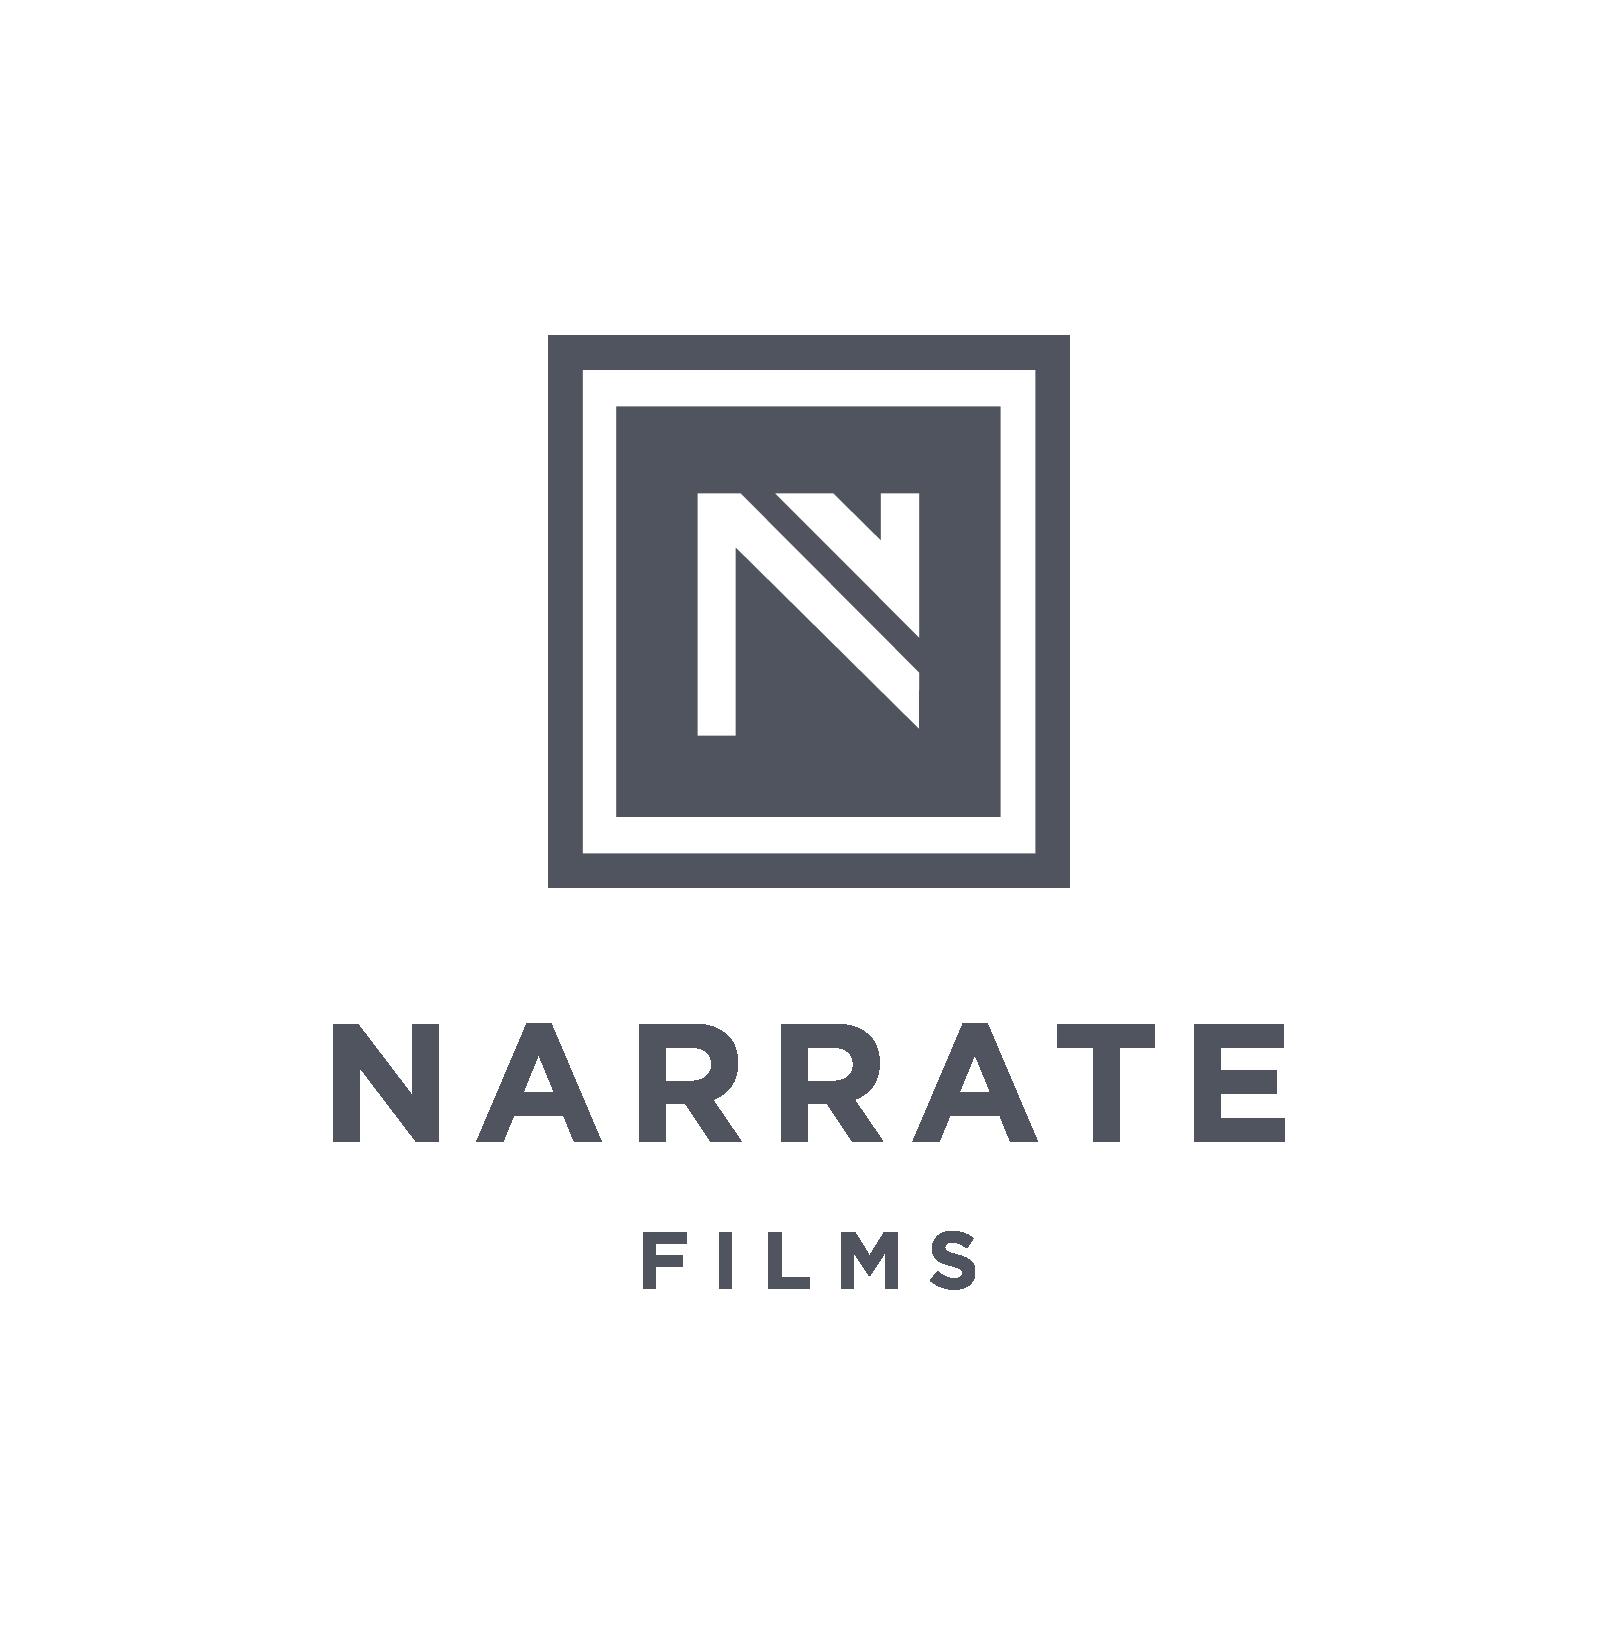 Narrate Films